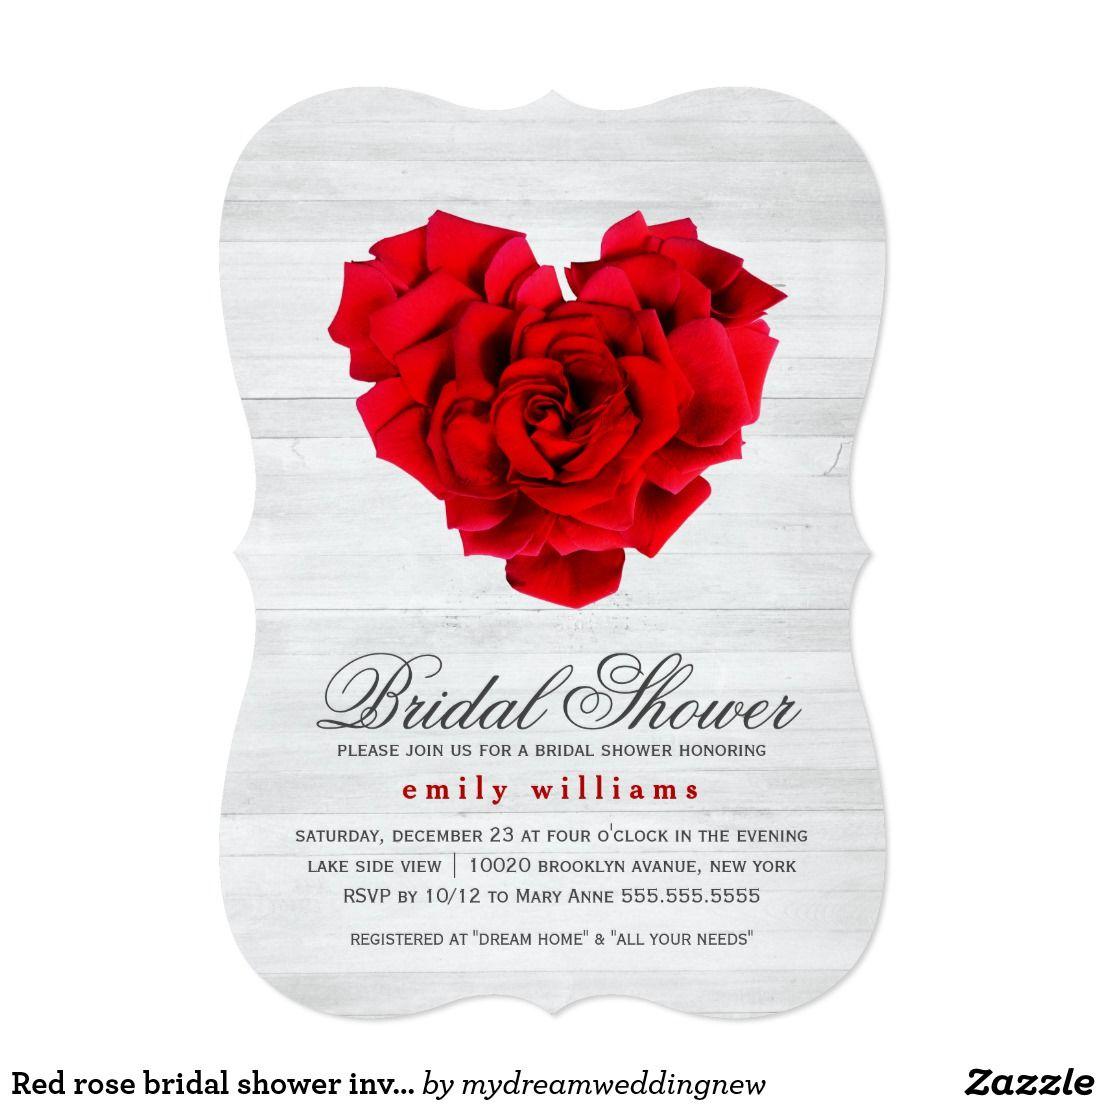 Red rose bridal shower invitation | Shower invitations, Bridal ...